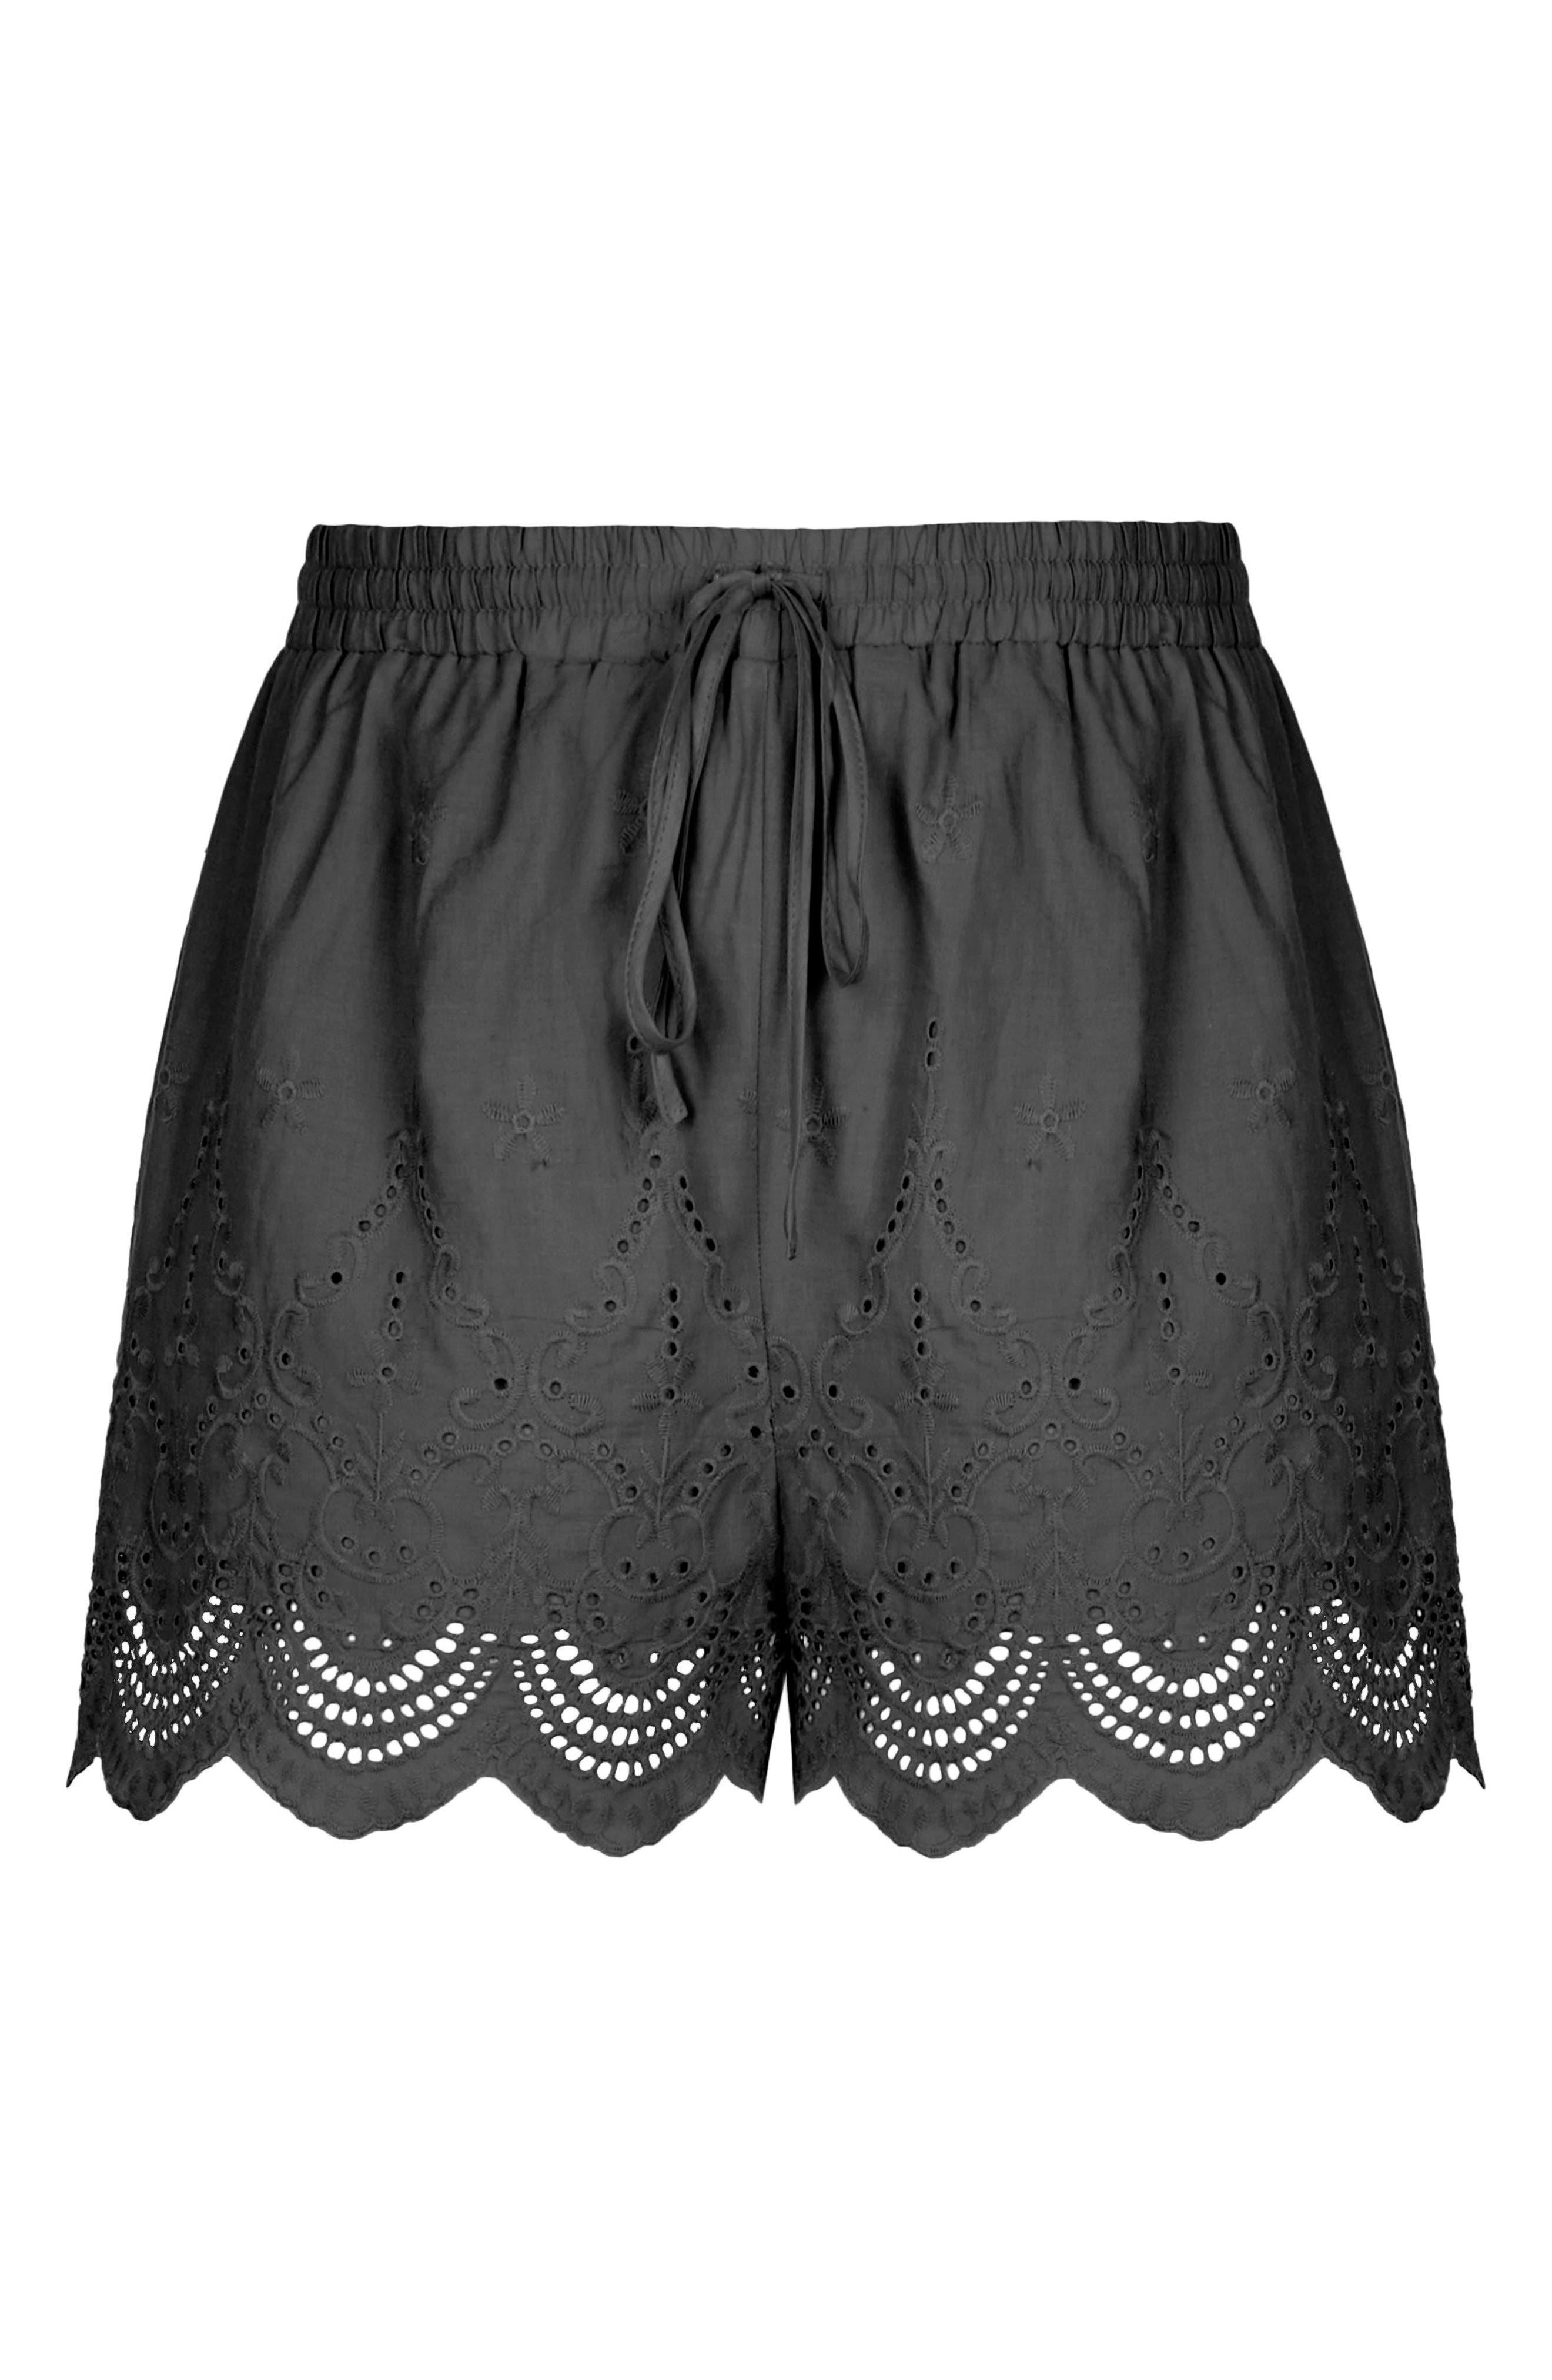 Summer Love Drawstring Shorts,                             Alternate thumbnail 3, color,                             002